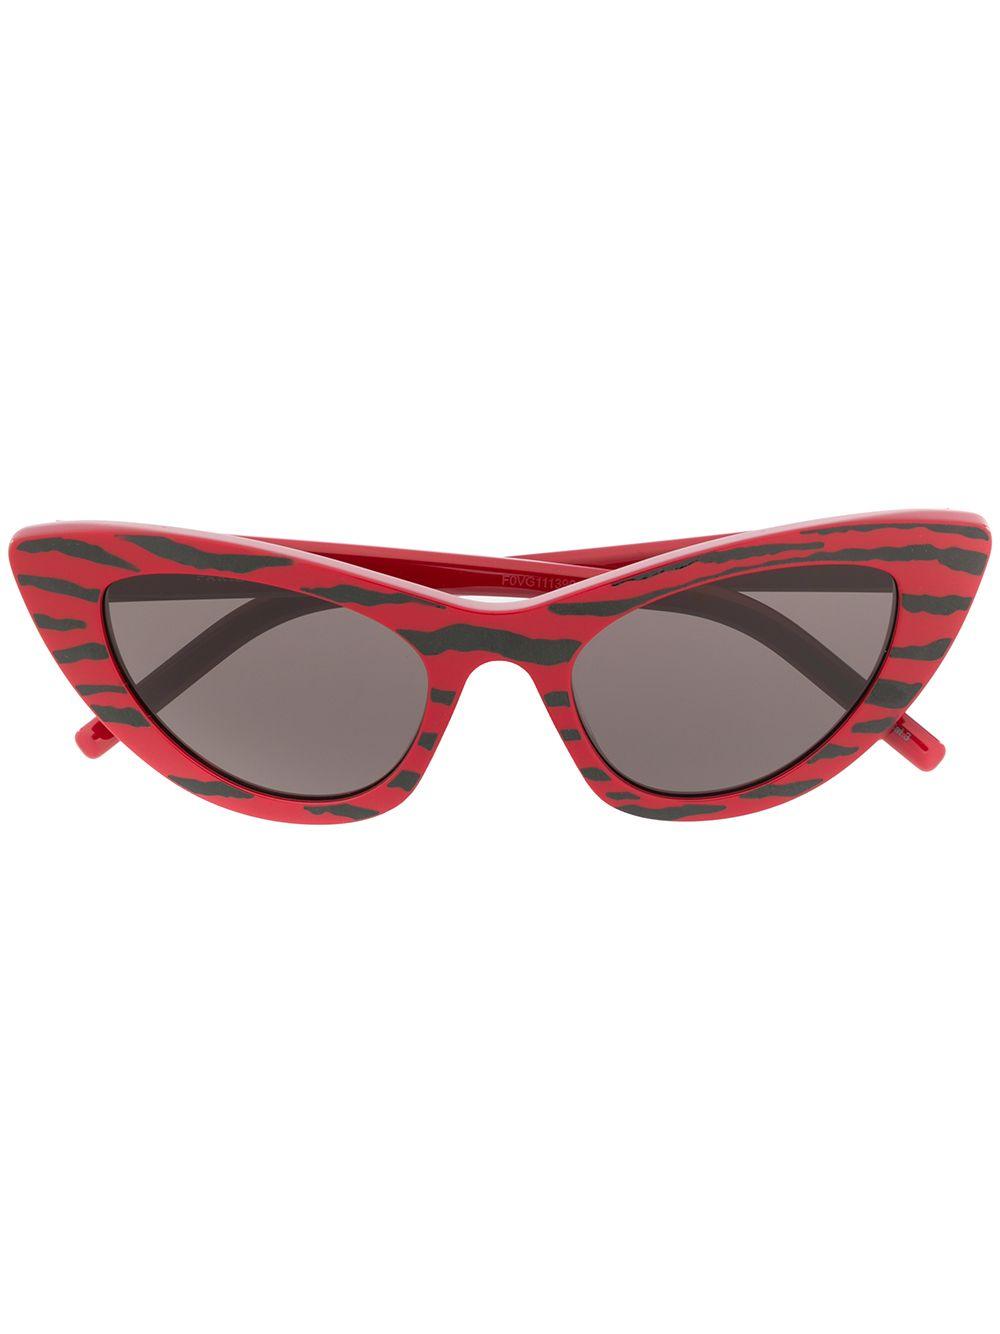 Zebra Print Sunglasses